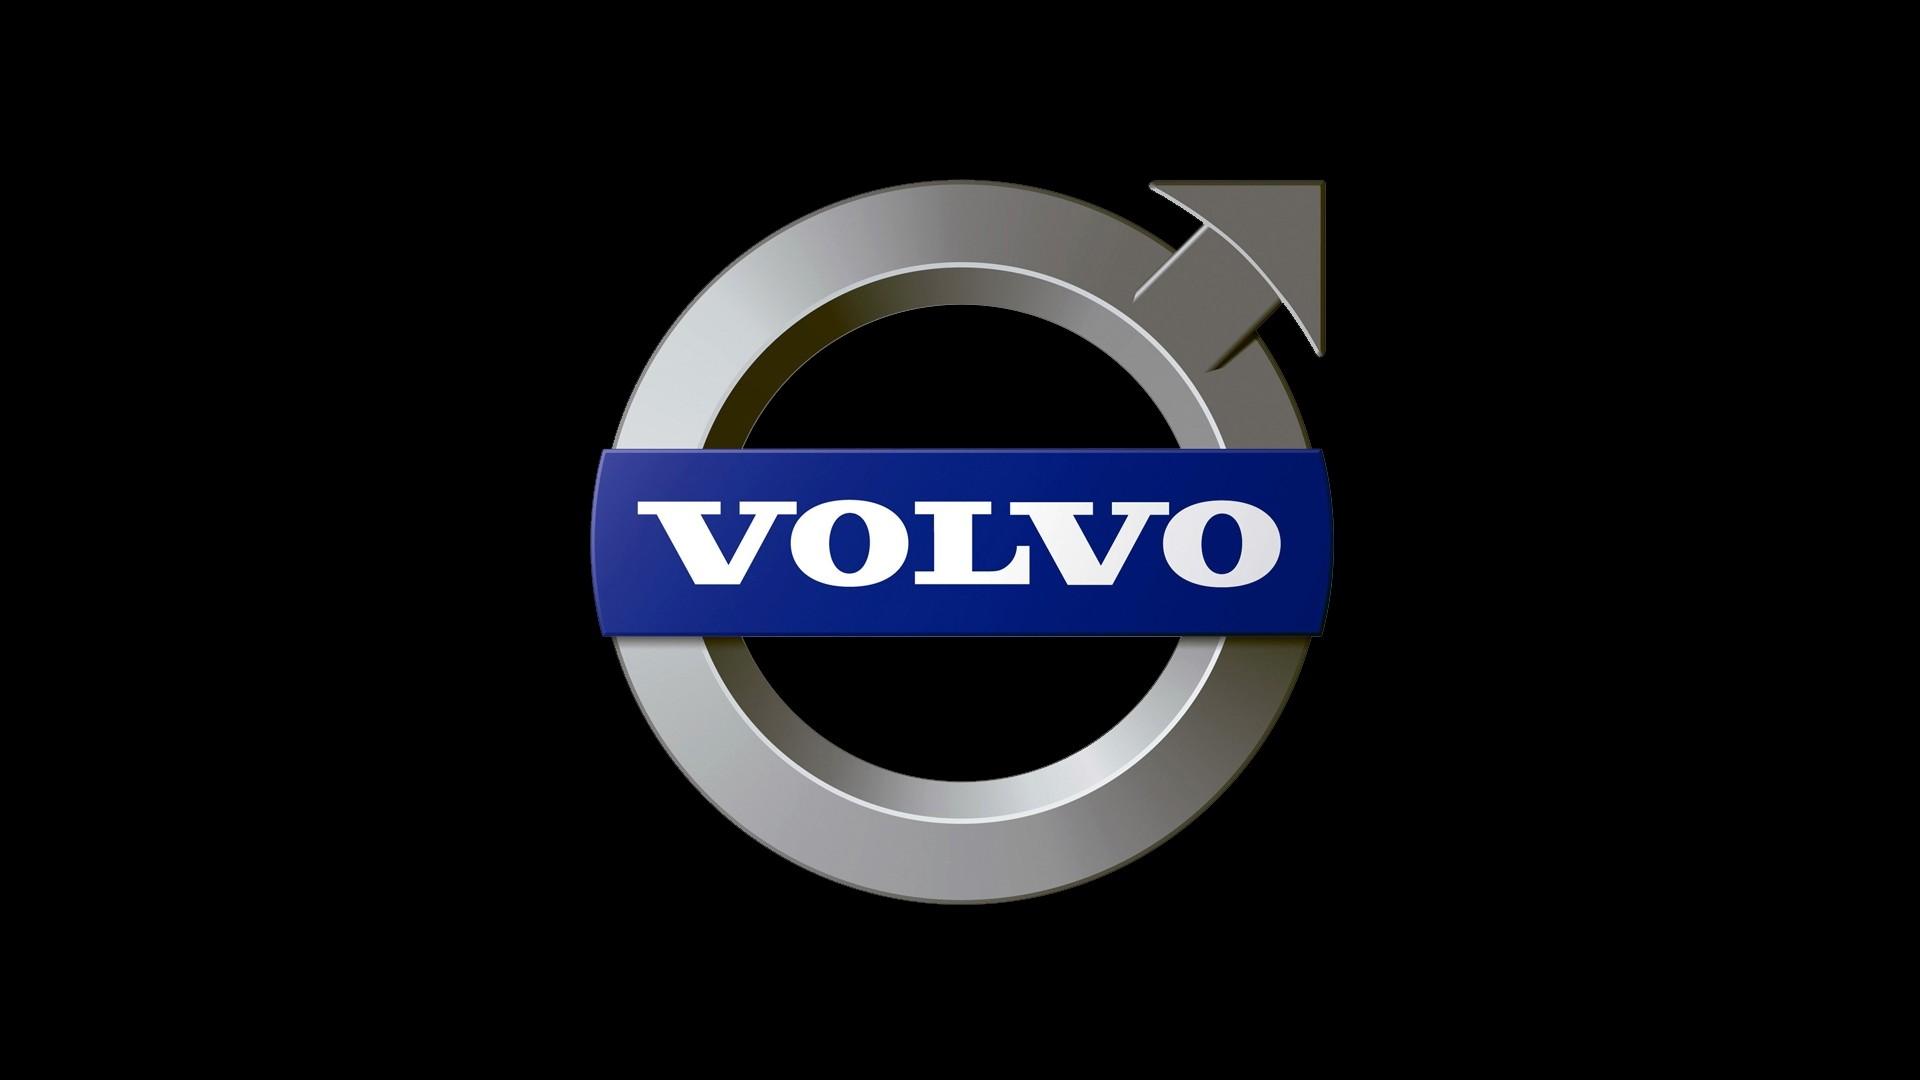 Volvo Logo Wallpaper Full HD #ARO